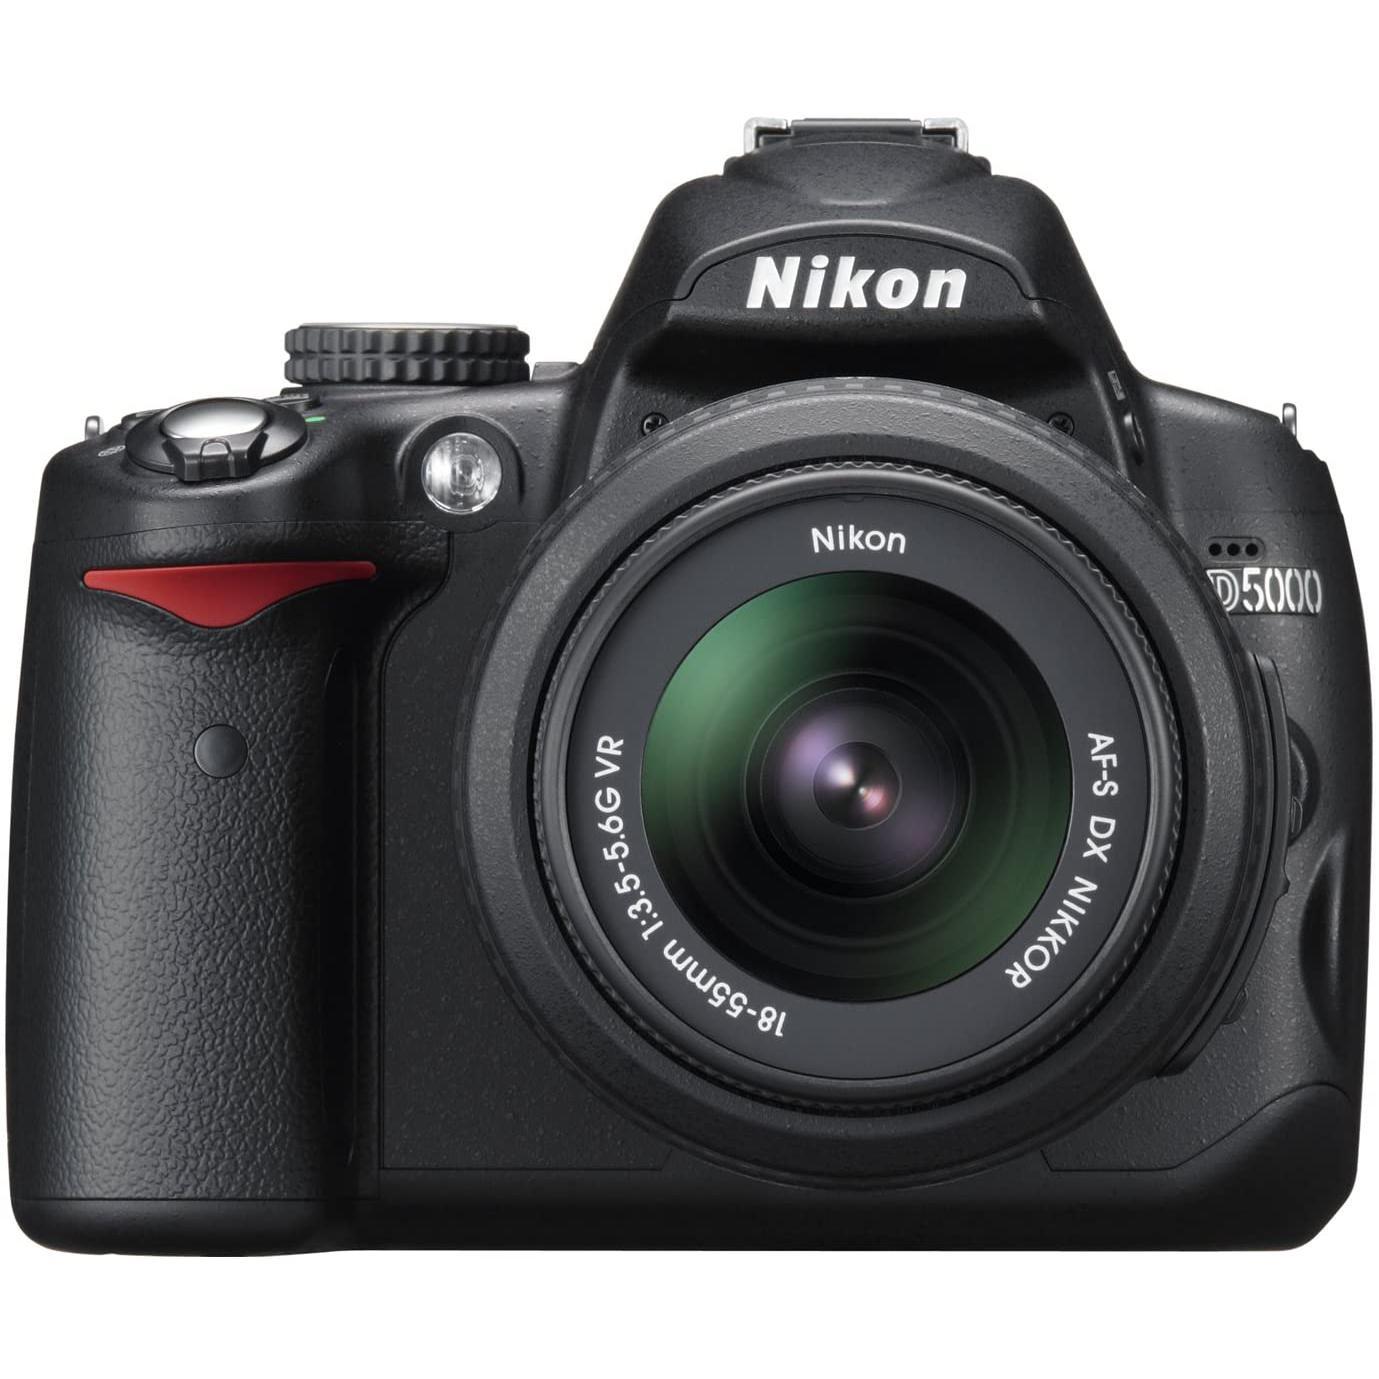 Reflex - Nikon D5000 - Noir + Objectif Nikon AF-S DX VR 18 - 55 mm f/3.5 - 5.6 G